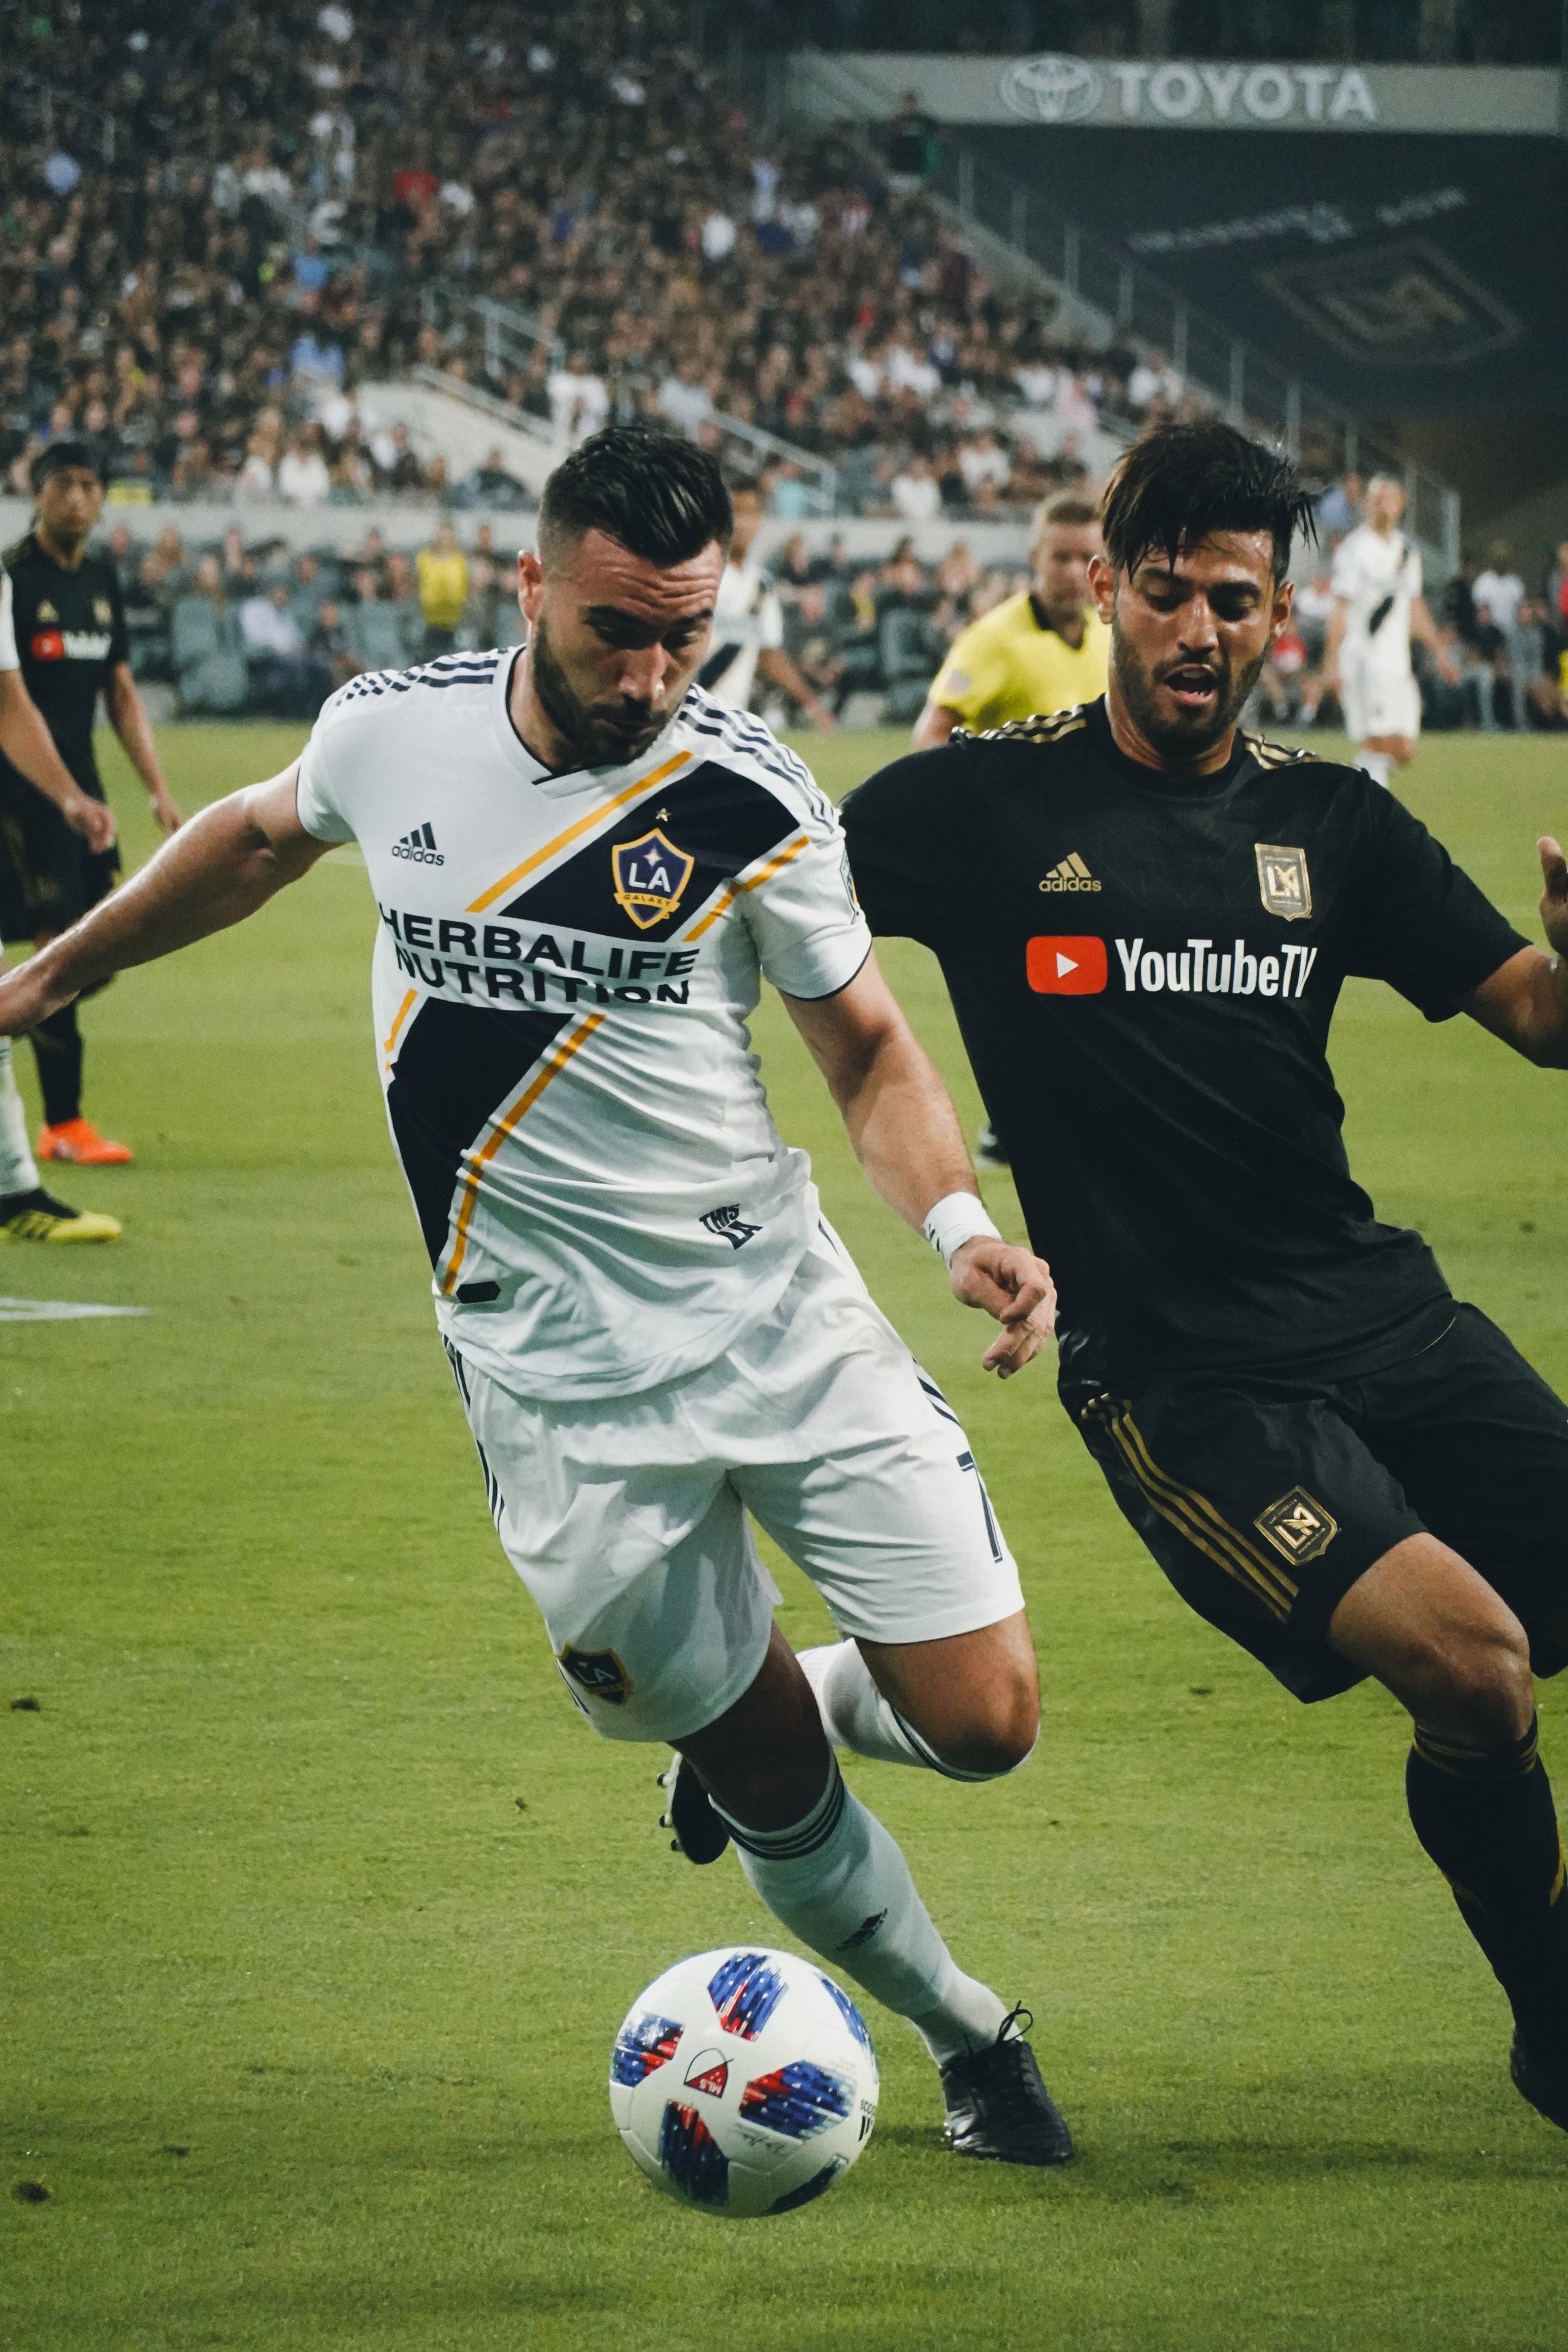 Carlos Vela battles Romaine Alessandrini, of the LA Galaxy for the ball in the LA Derby